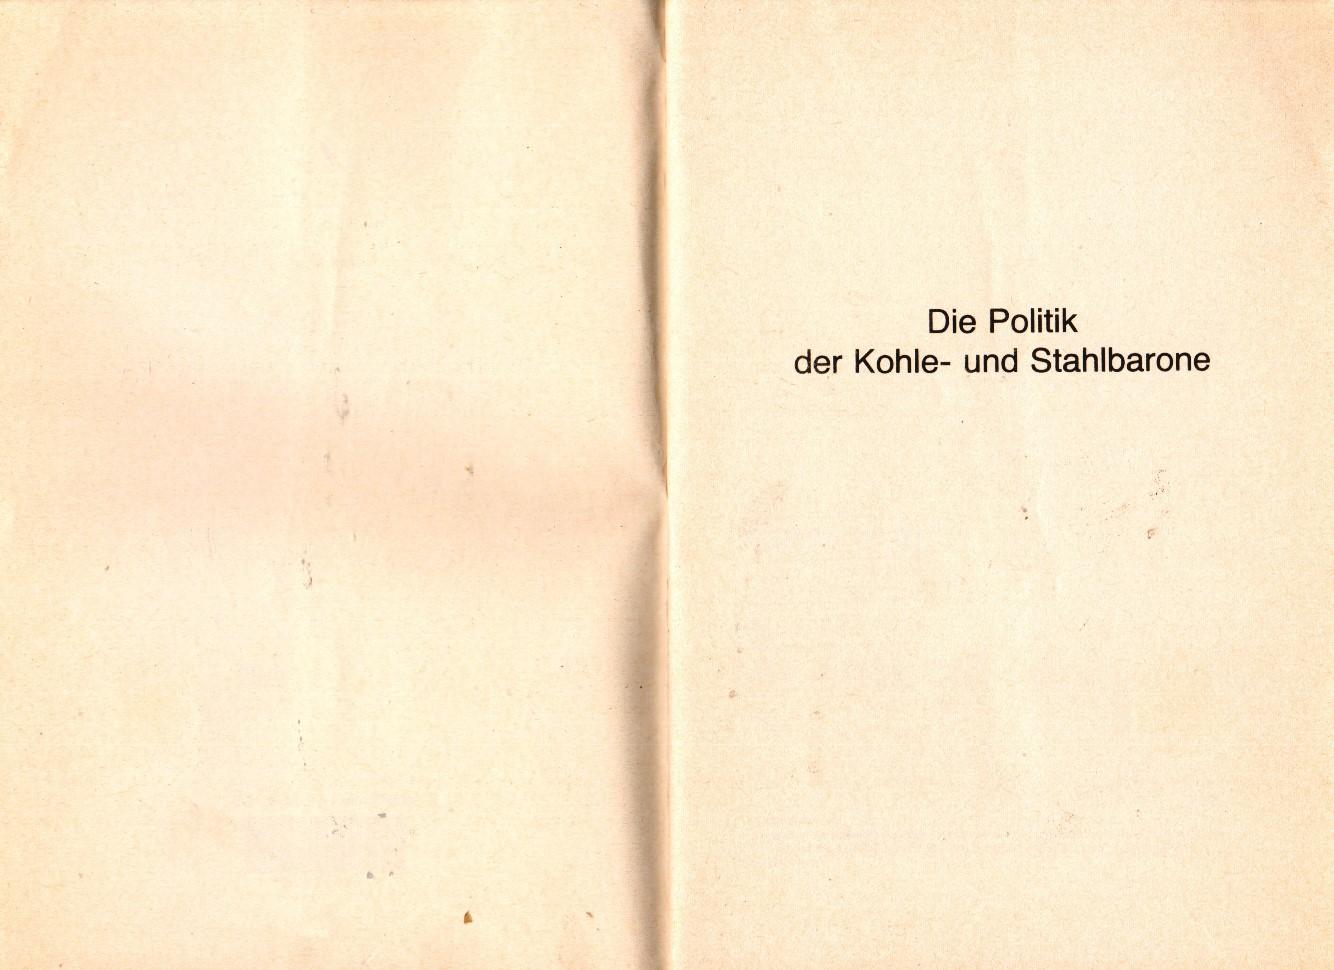 NRW_KBW_1977_Politik_der_Kohle_u_Stahlbarone_02